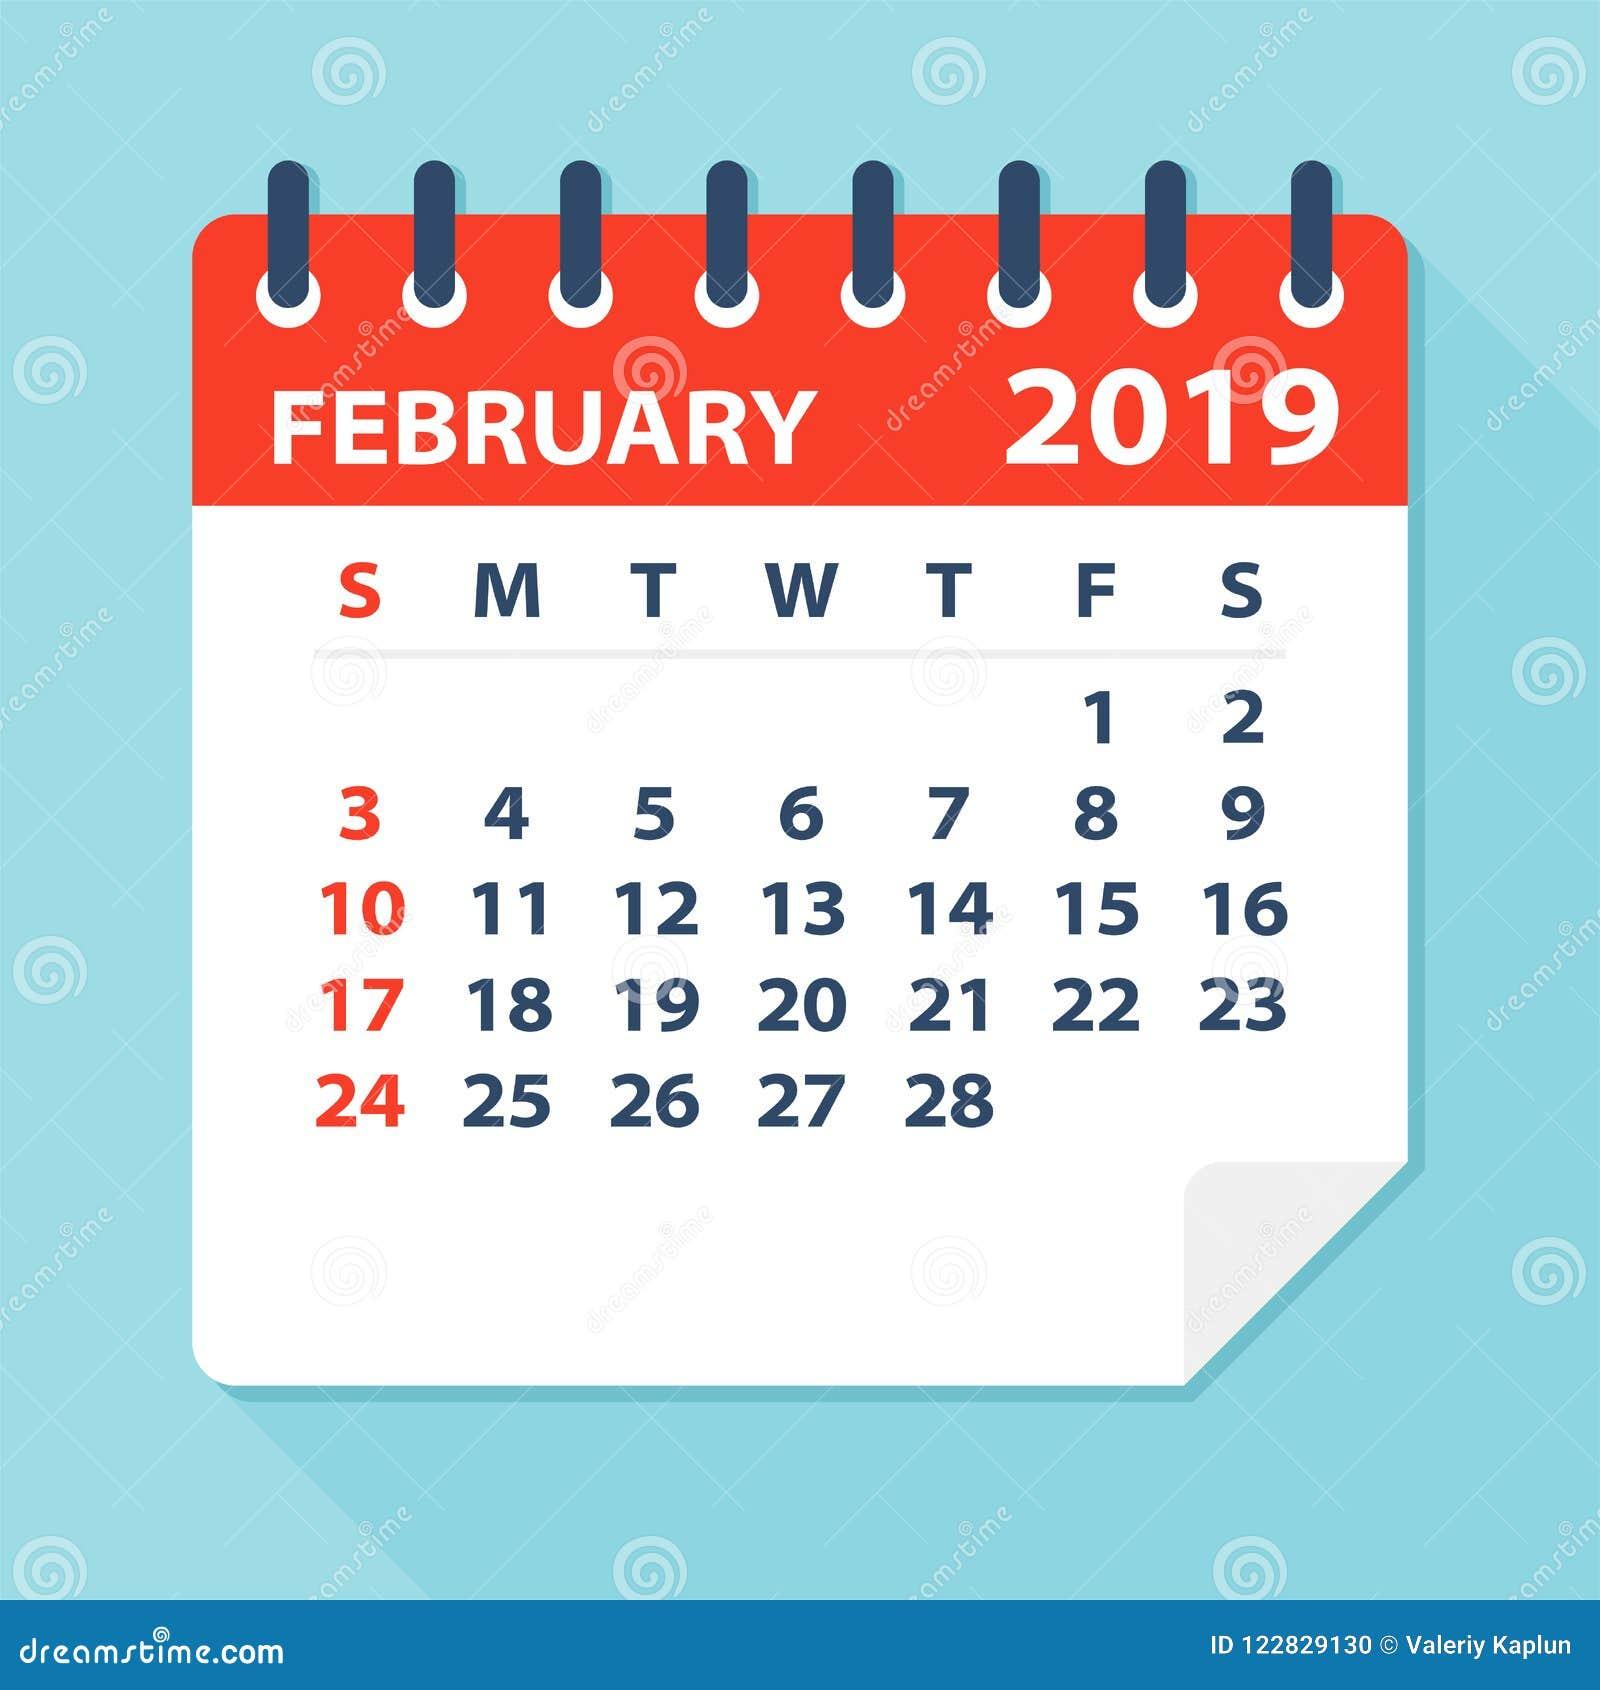 Calendar Page Image February 1 2019 February 2019 Calendar Leaf   Vector Illustration Stock